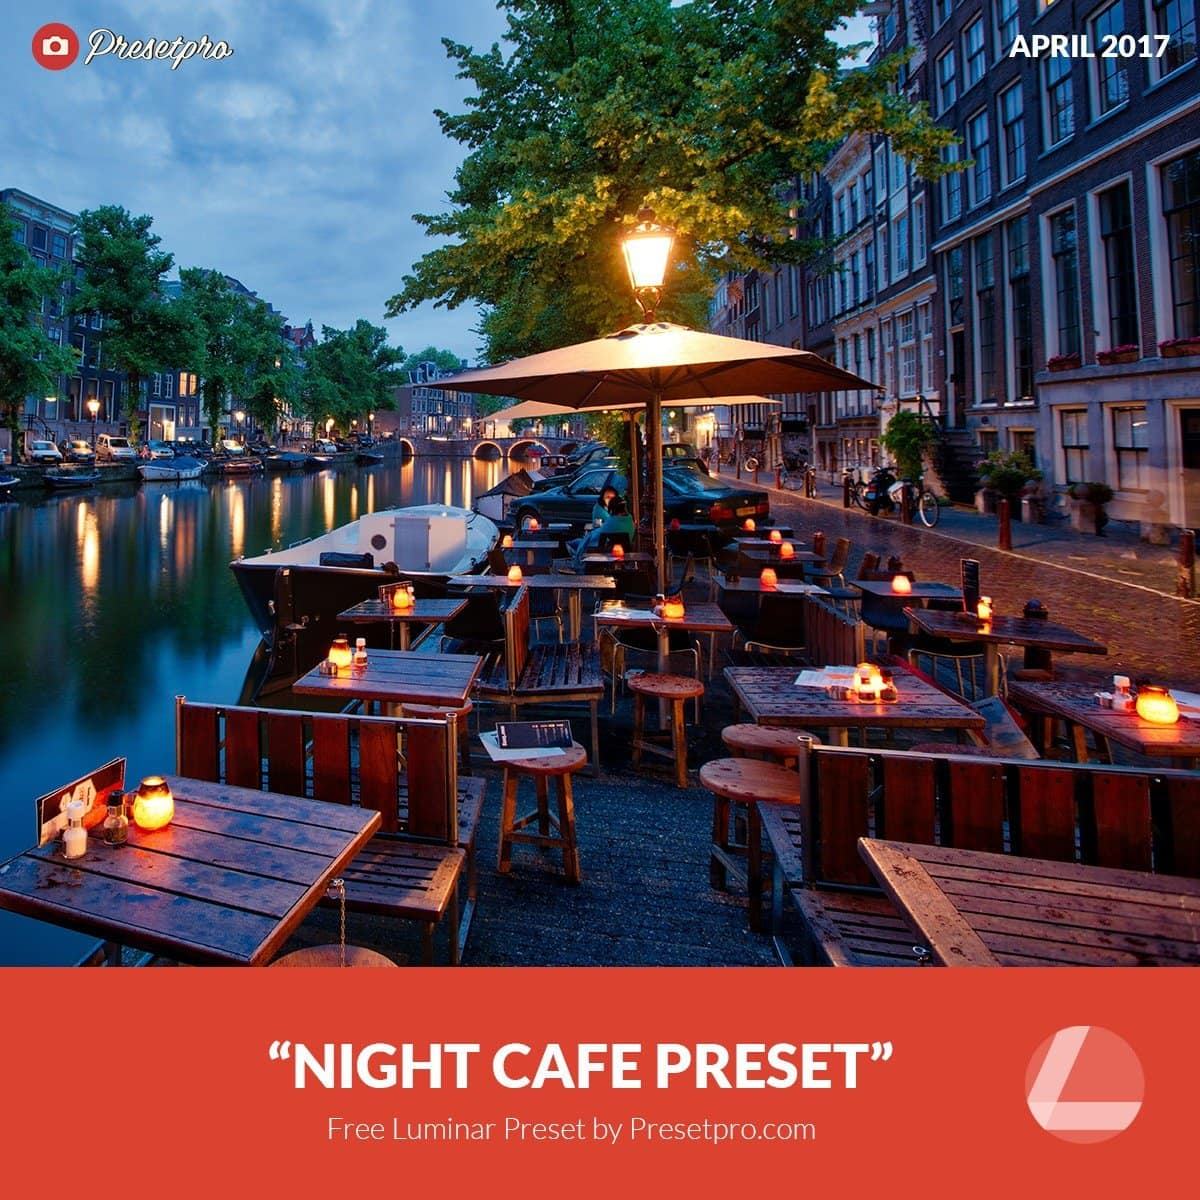 Free-Luminar-Preset-Night-Cafe